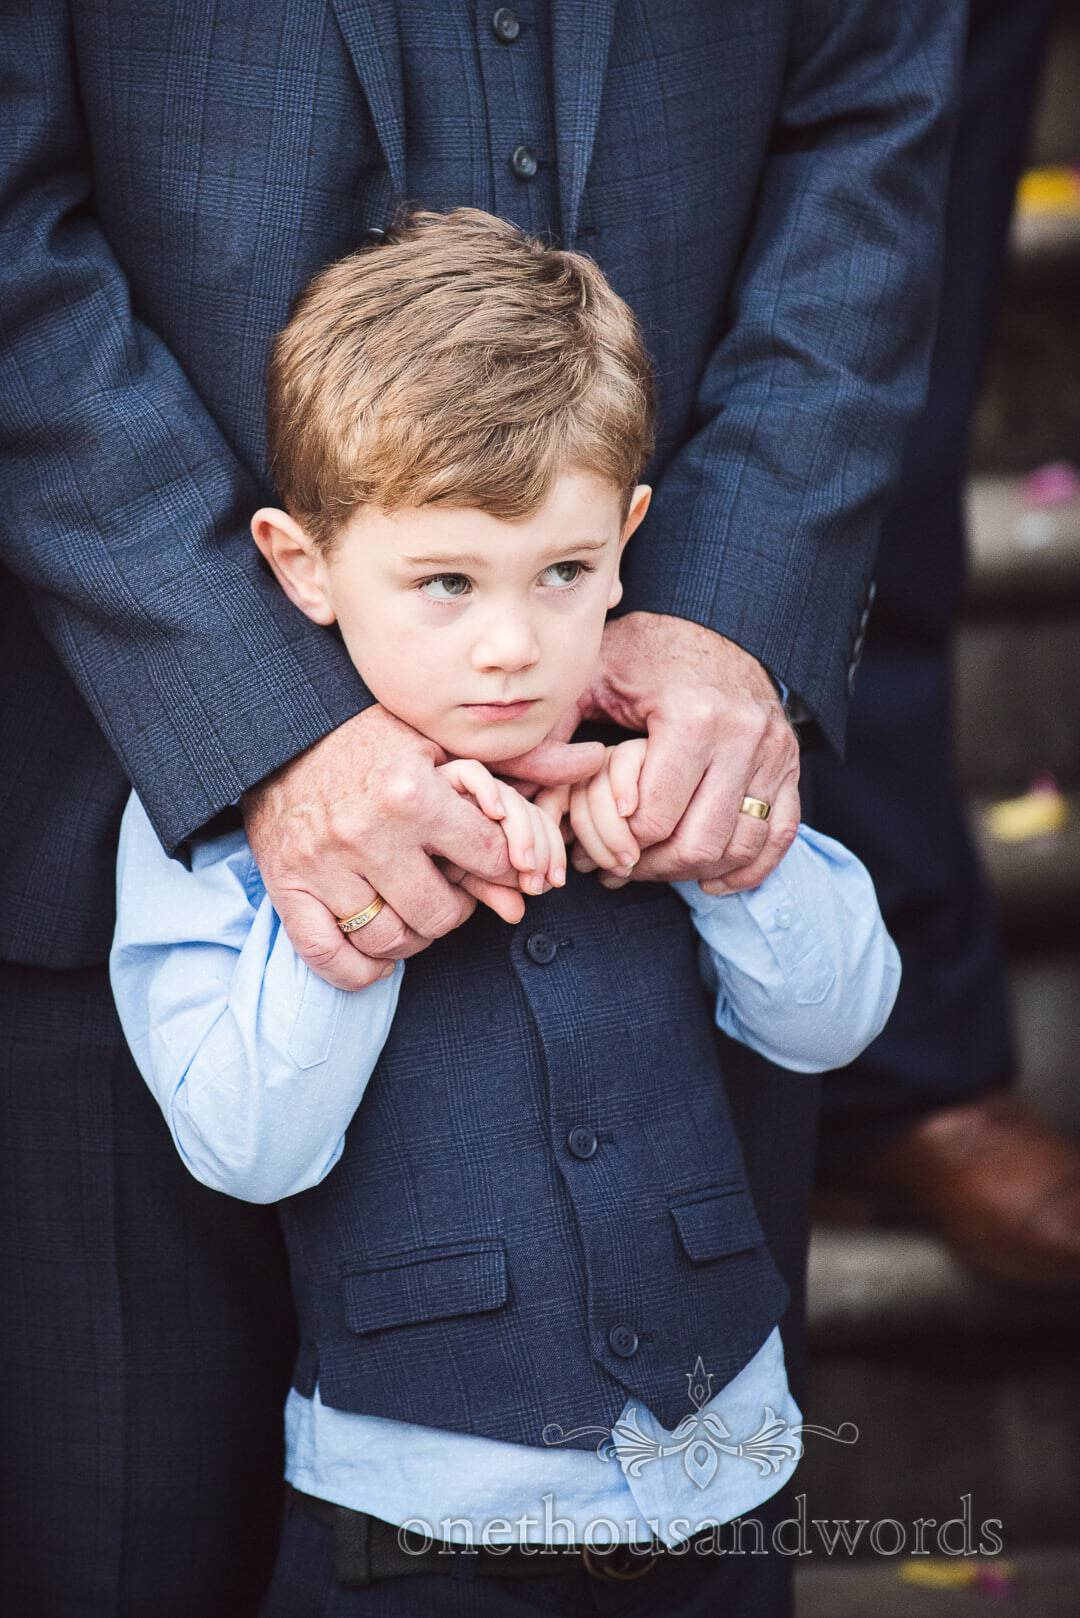 Bride and Groom's son portrait photograph during Italian Villa Wedding group photos